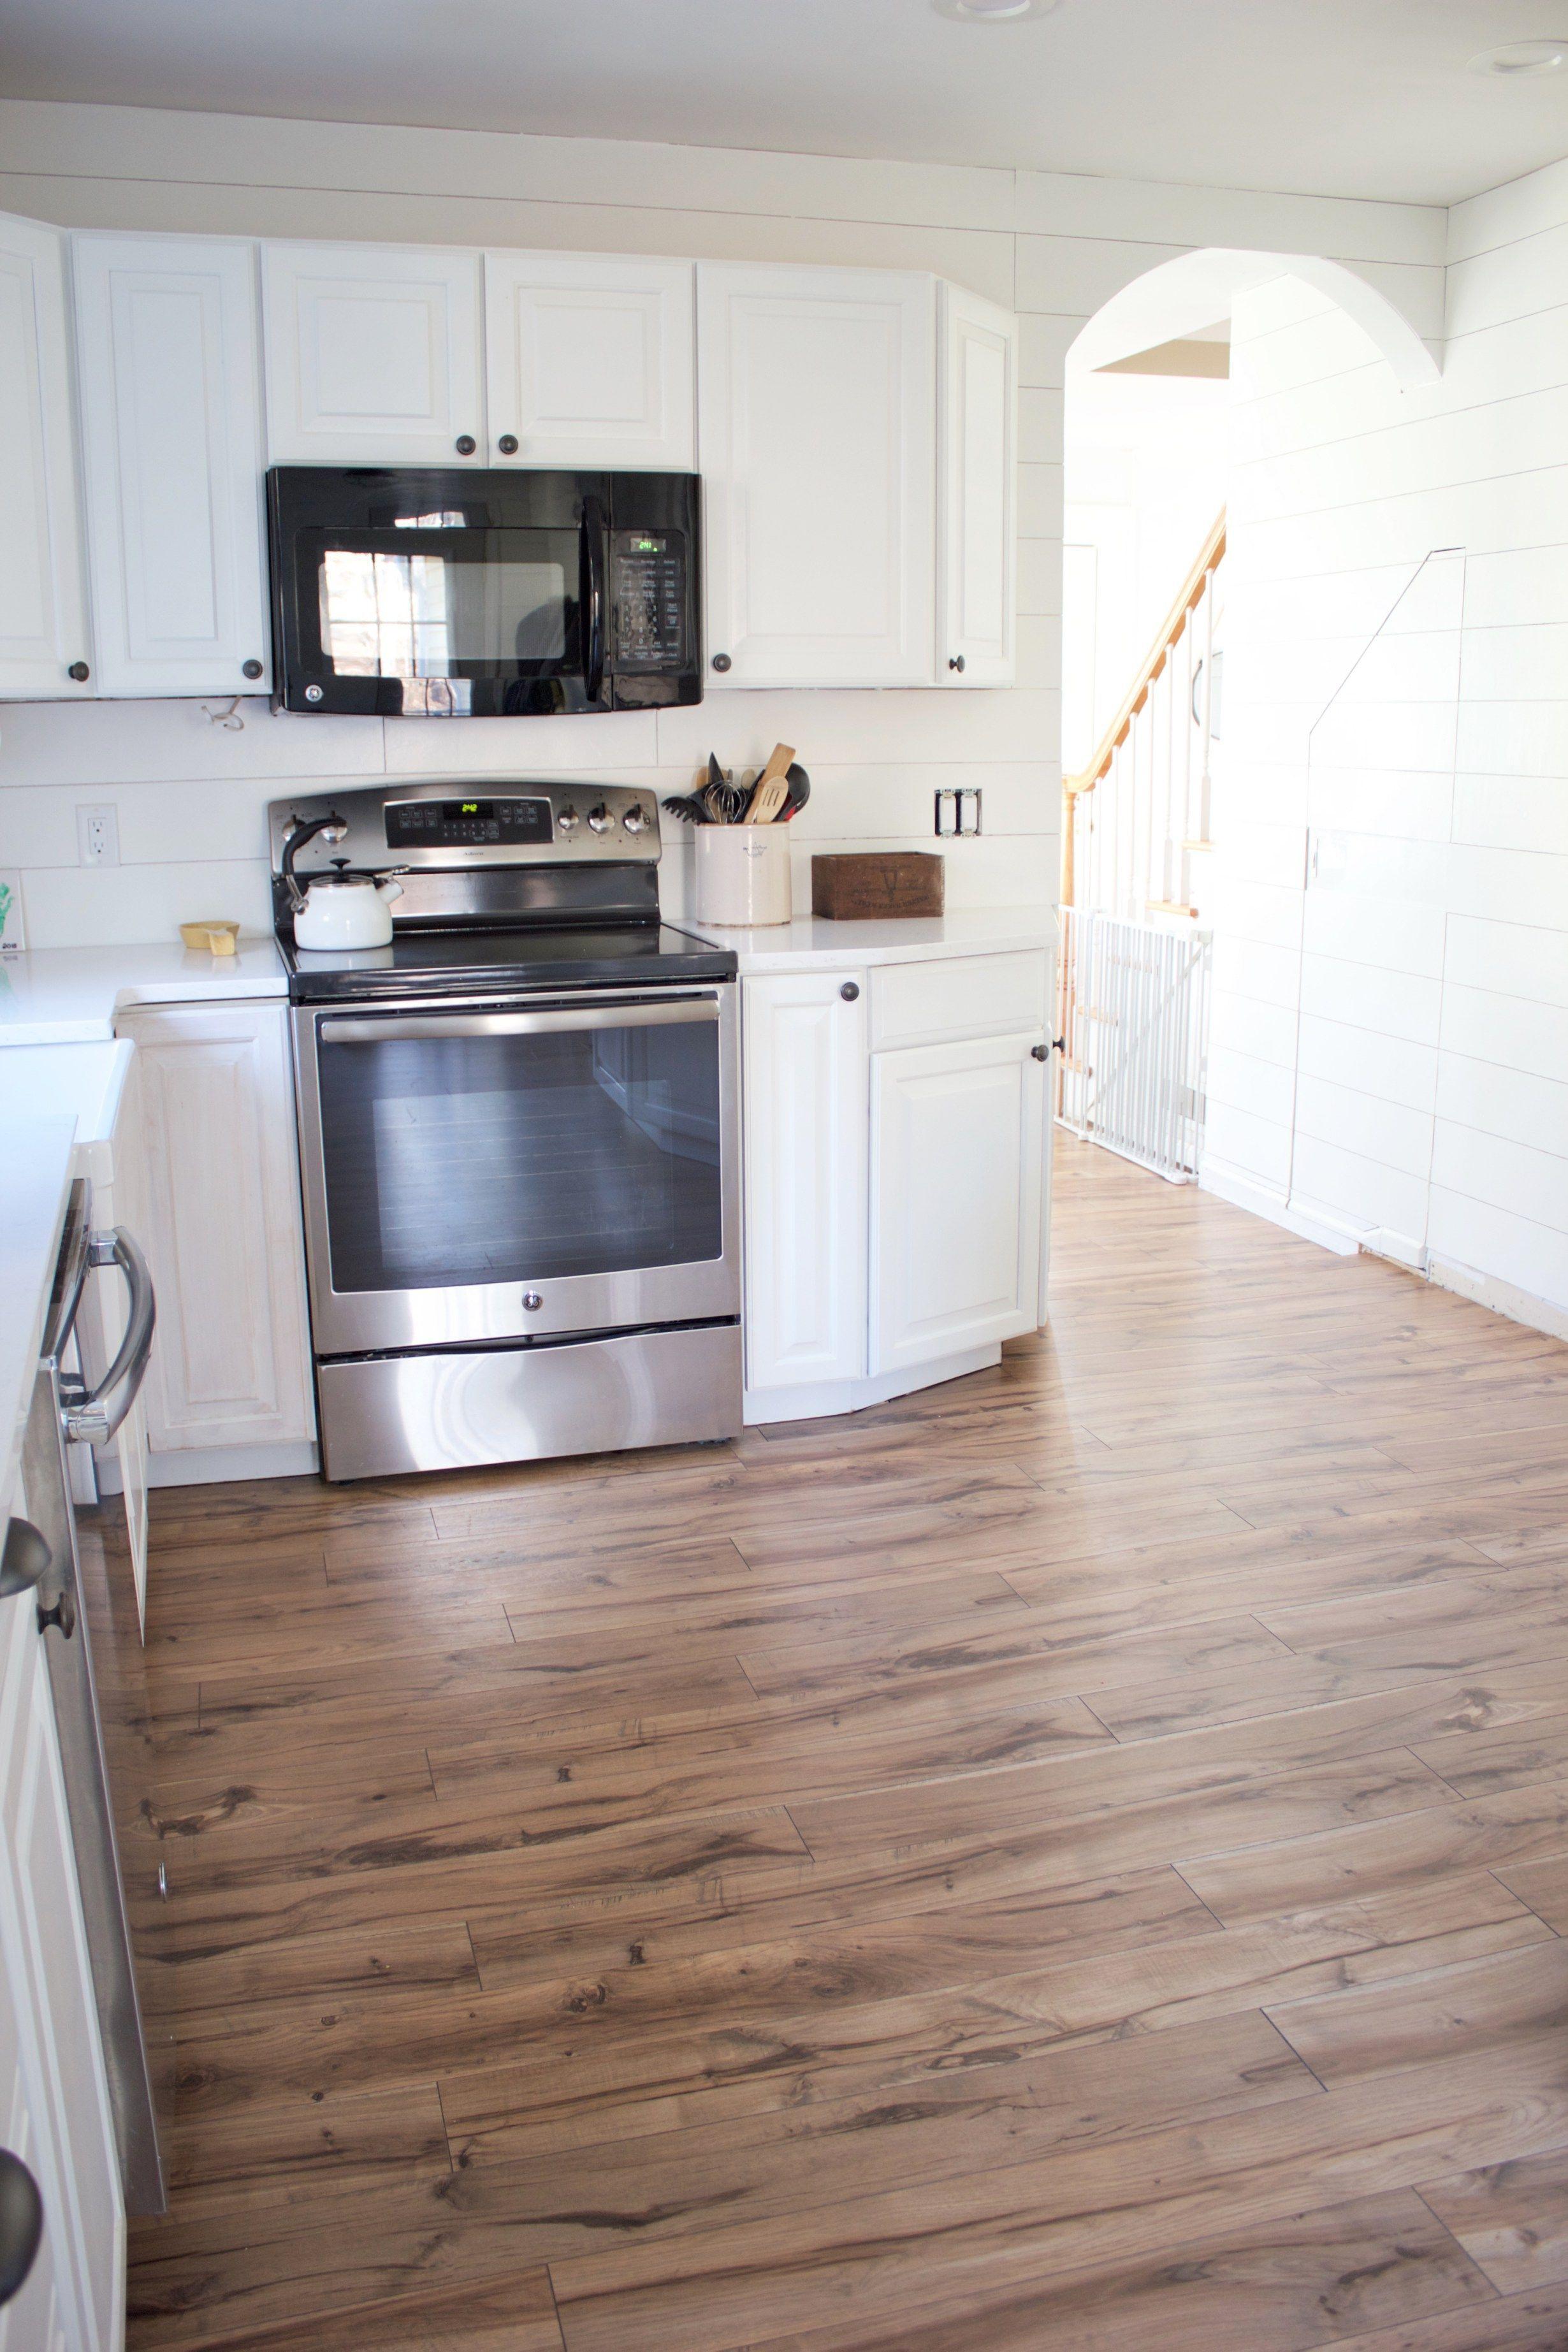 29 kitchen flooring ideas design dengan gambar on kitchen flooring ideas id=35267